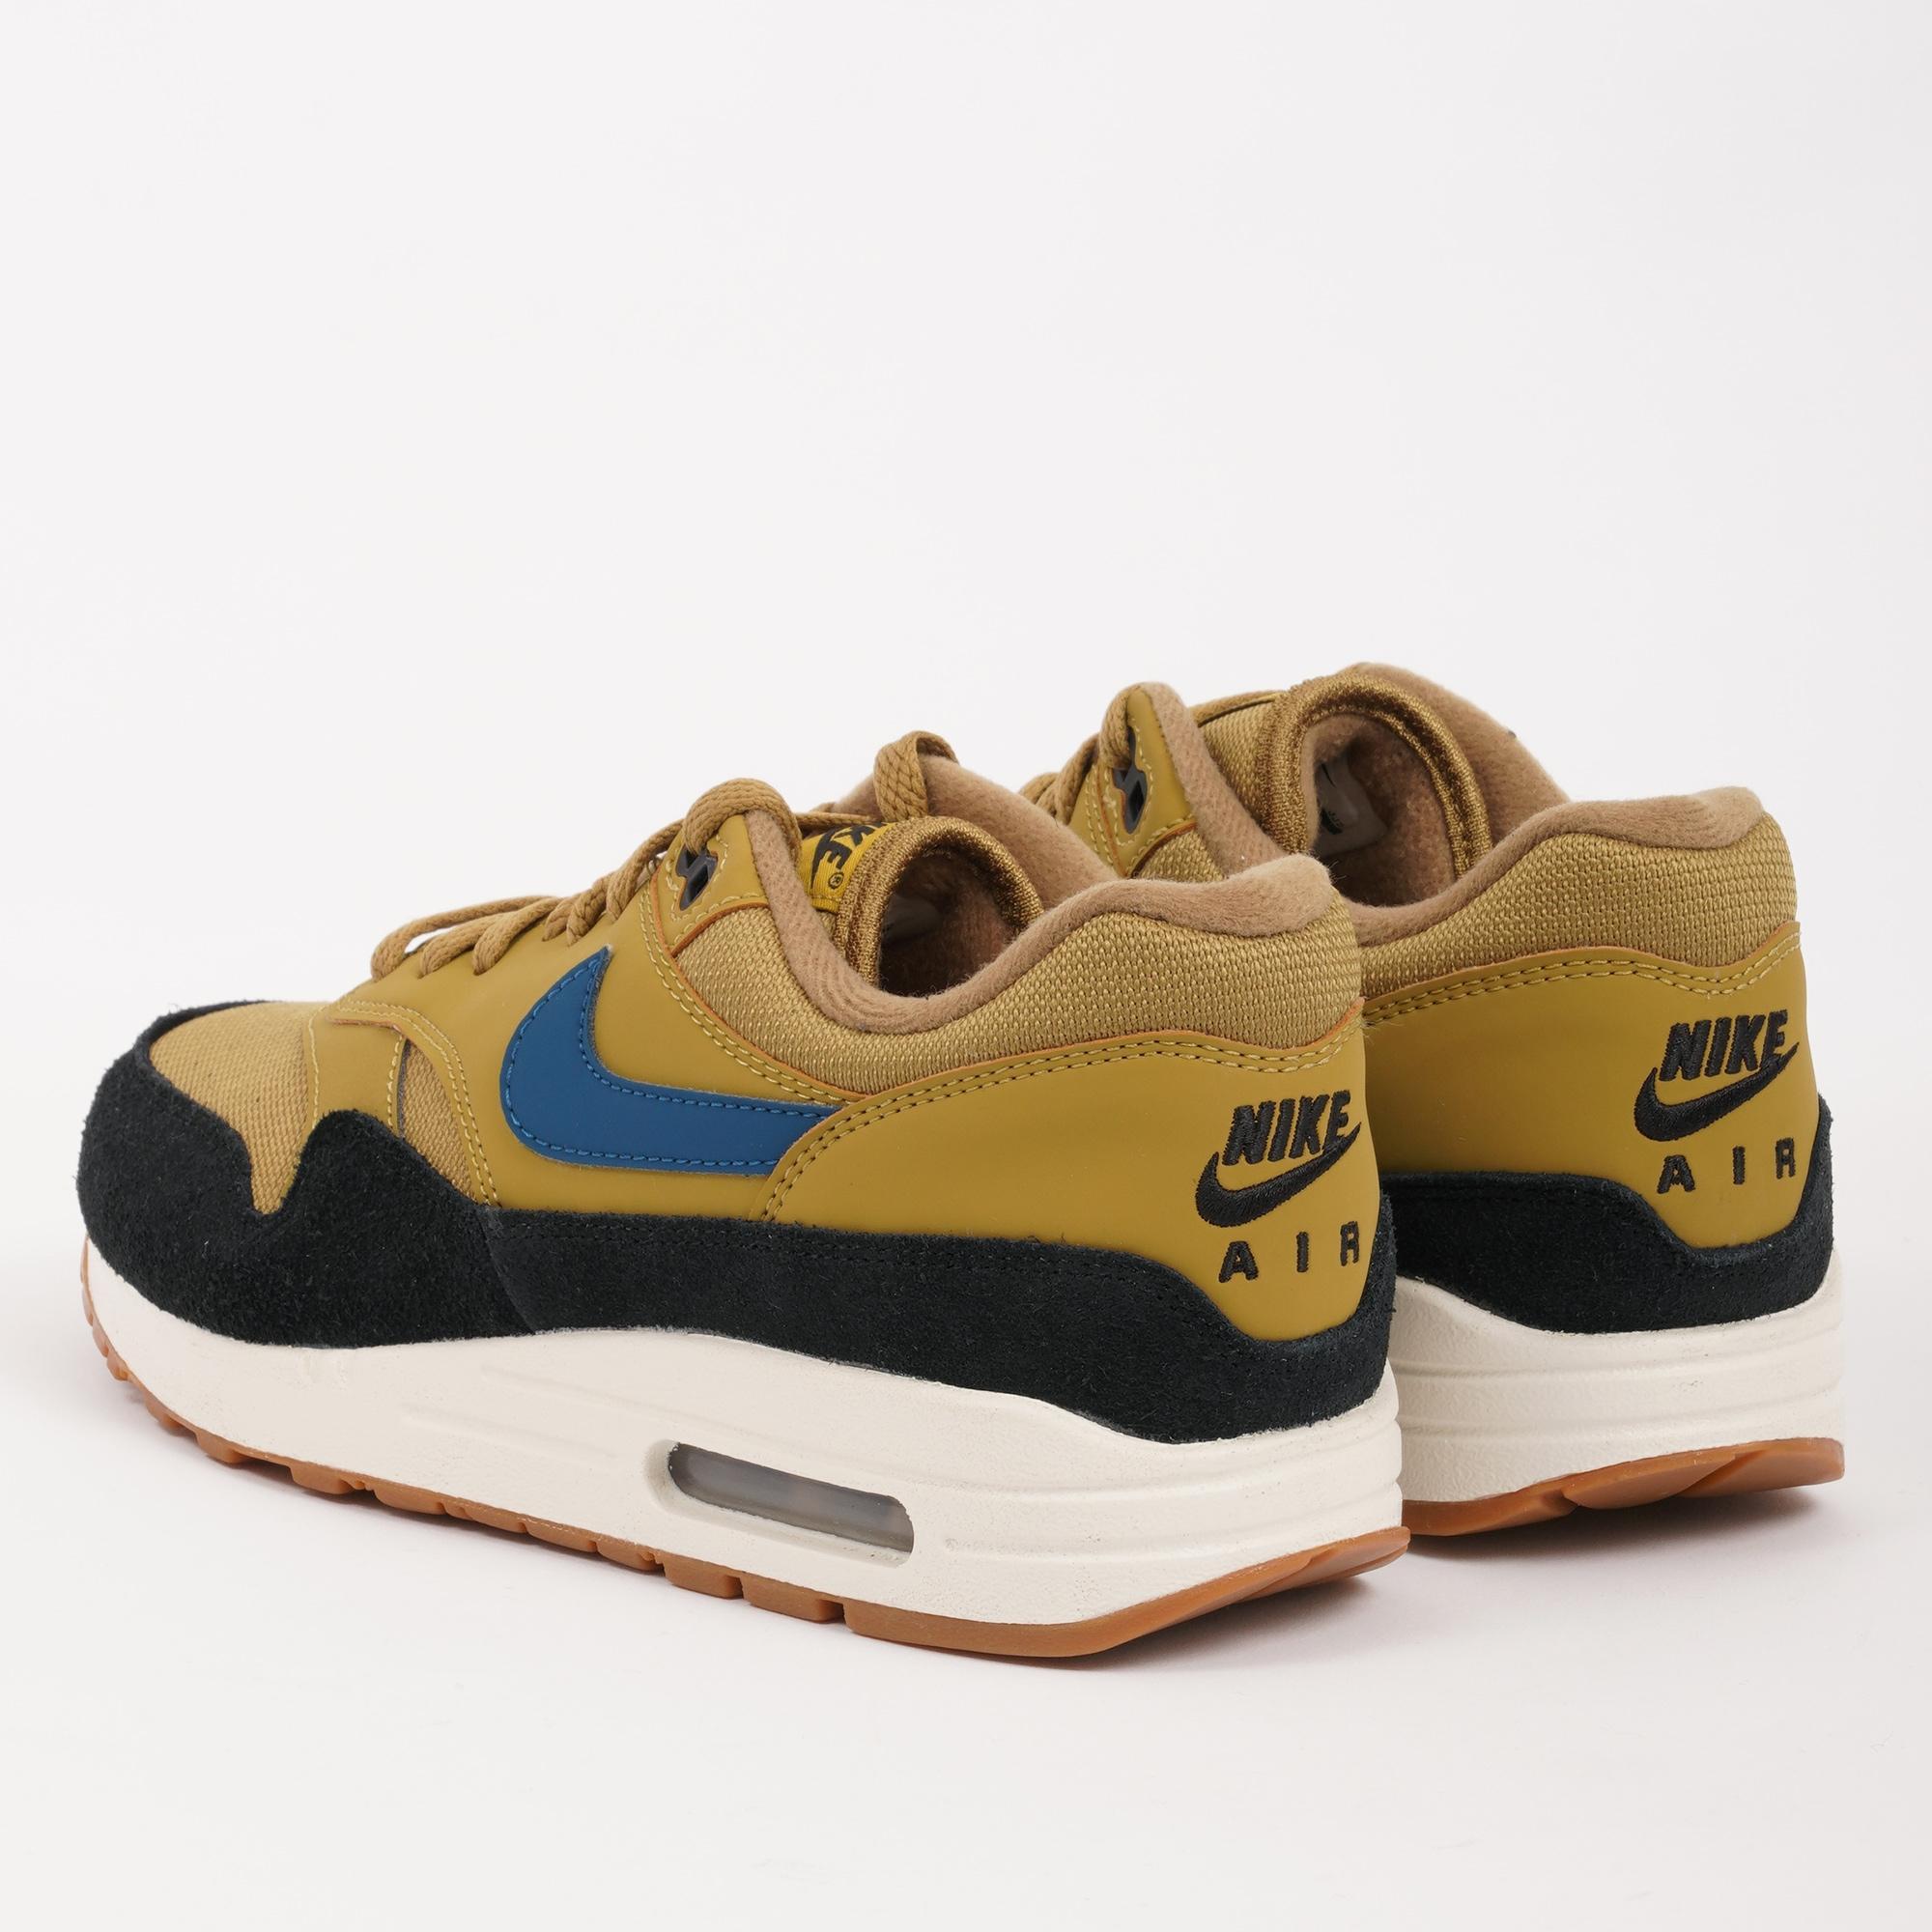 c288d251f Nike Air Max 1 - Golden Moss, Blue Force & Black for Men - Lyst